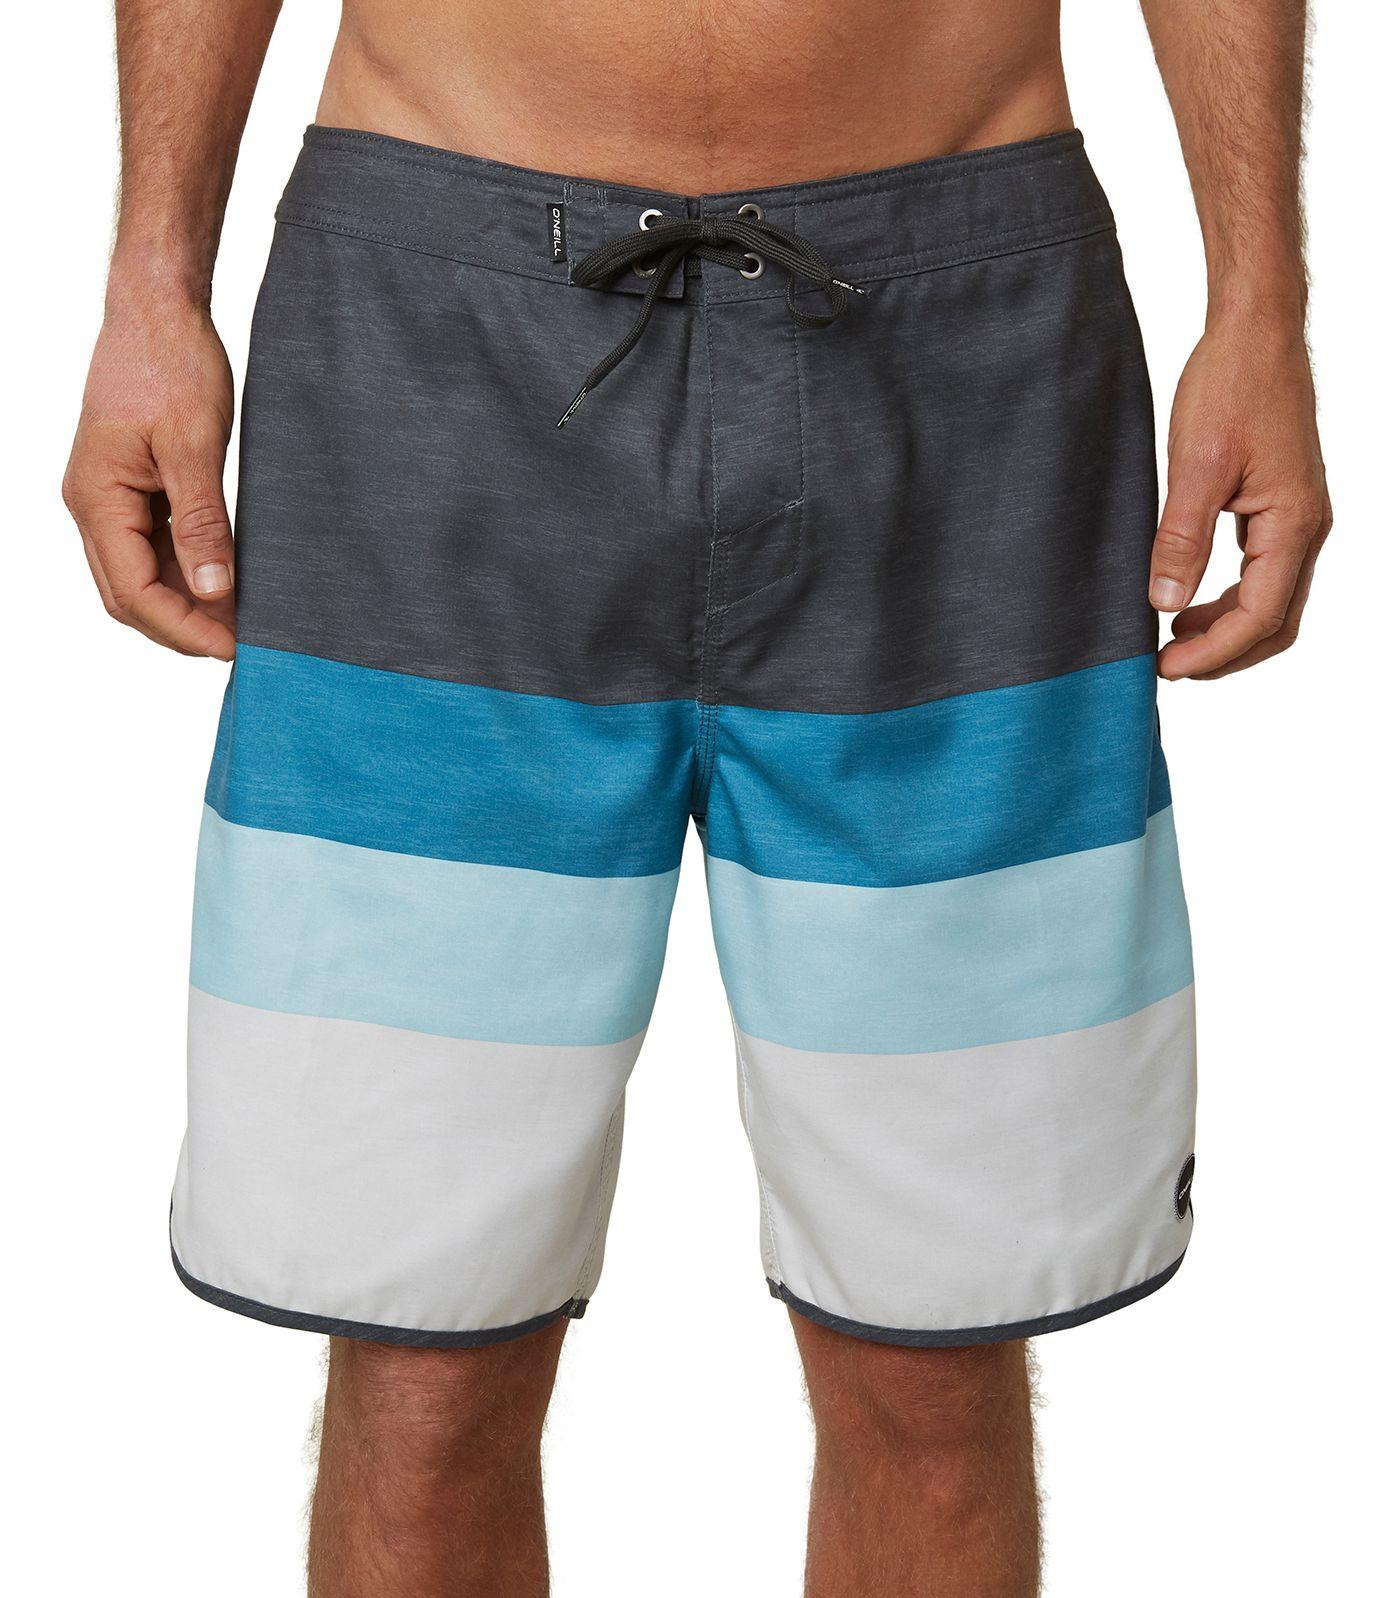 O'Neill Men's Four Square Board Shorts